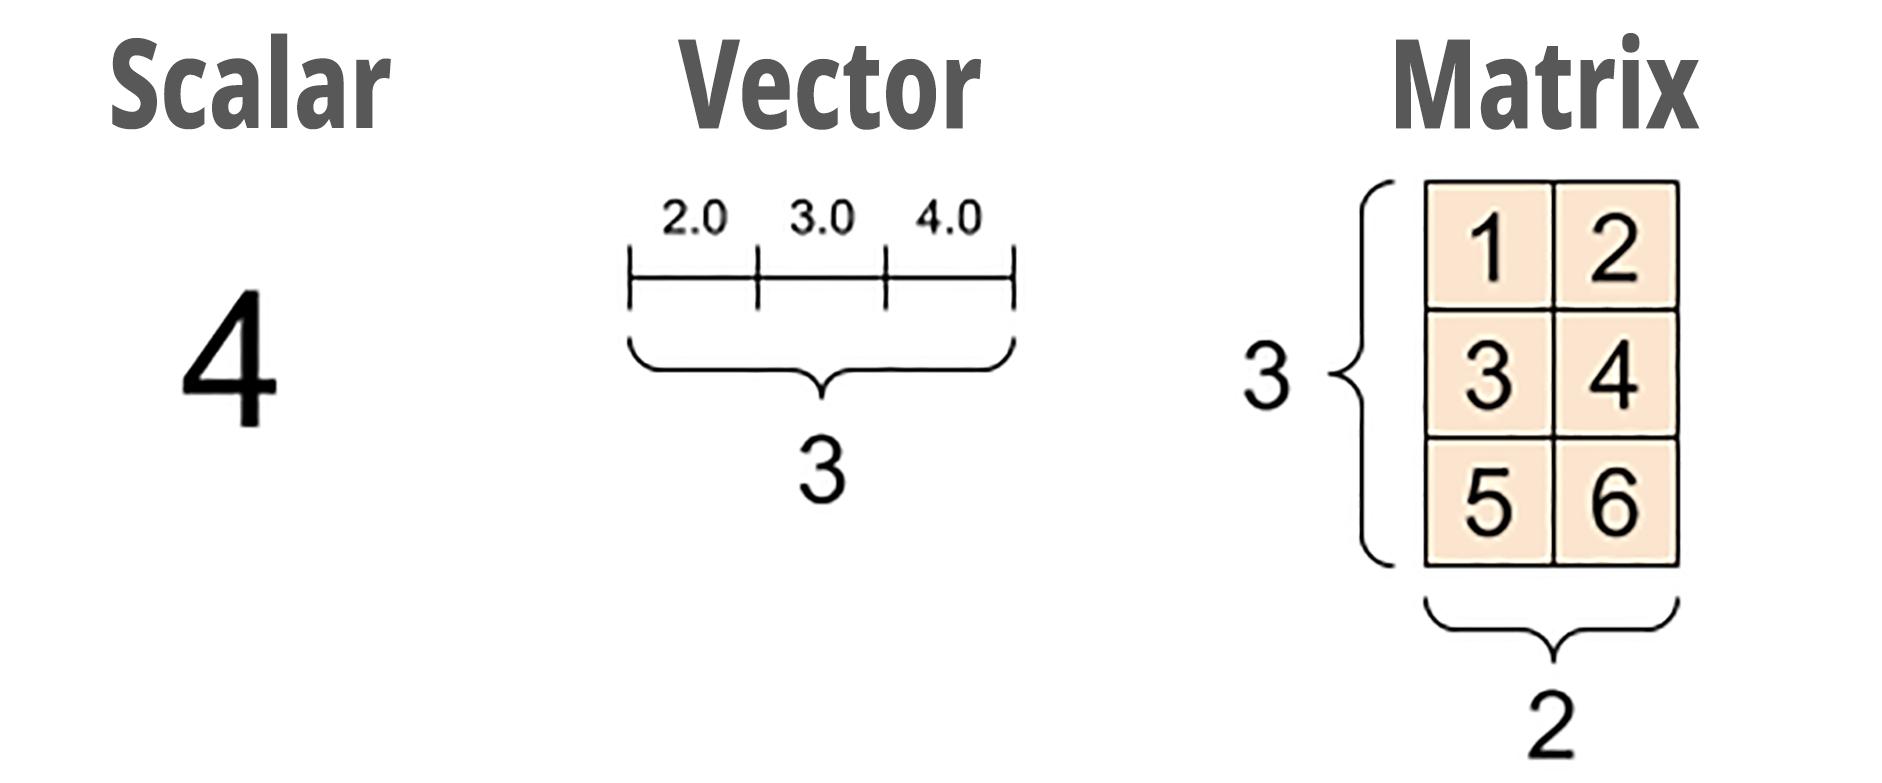 Scalar, Vector, Matrix